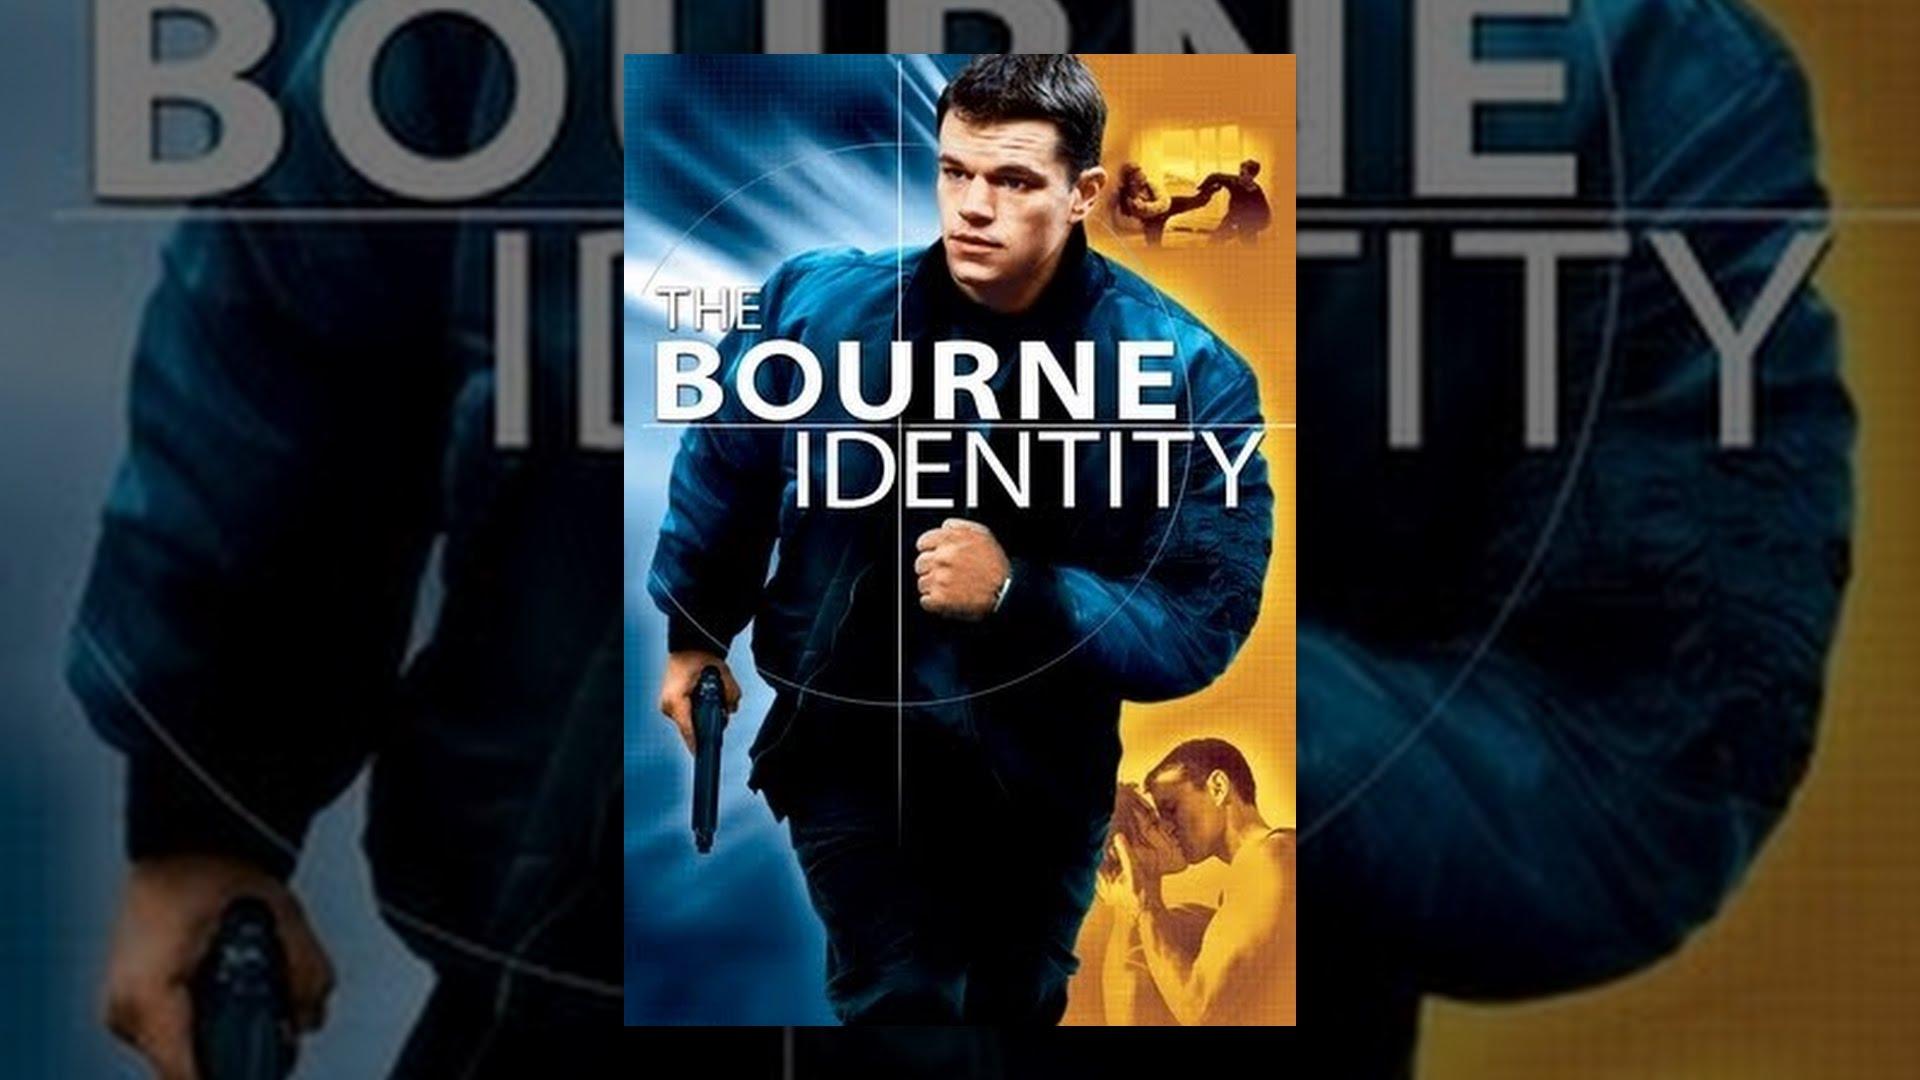 jason bourne movie download yify